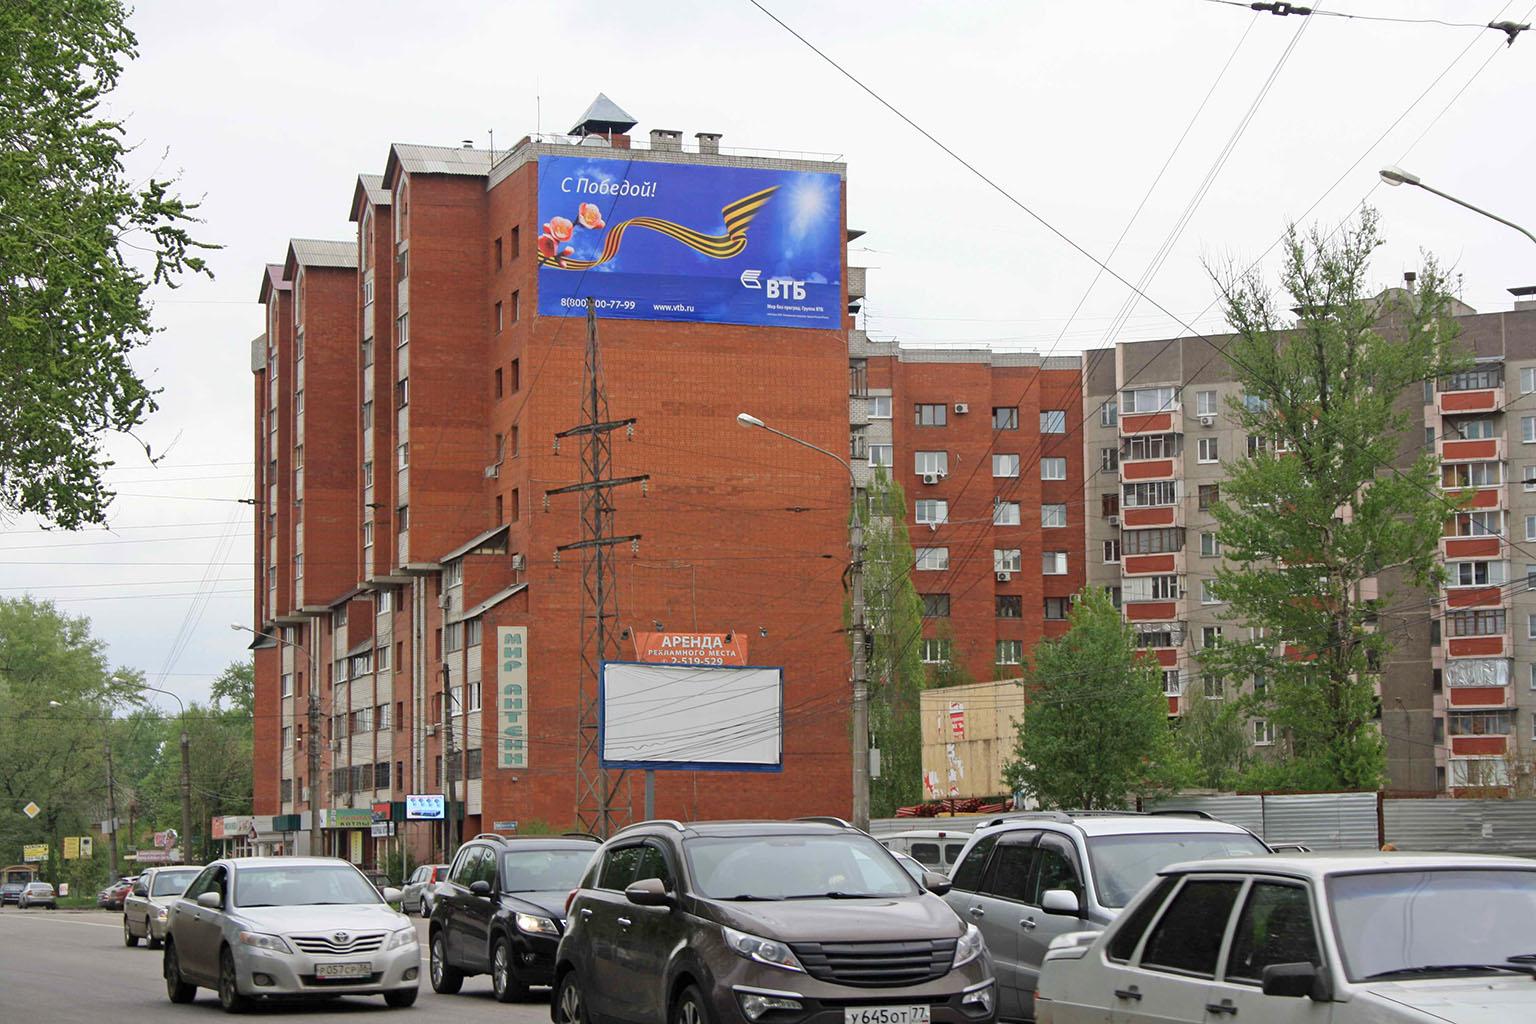 «С Победой!» - брандмауэр Воронеж, пр-т Труда, 151